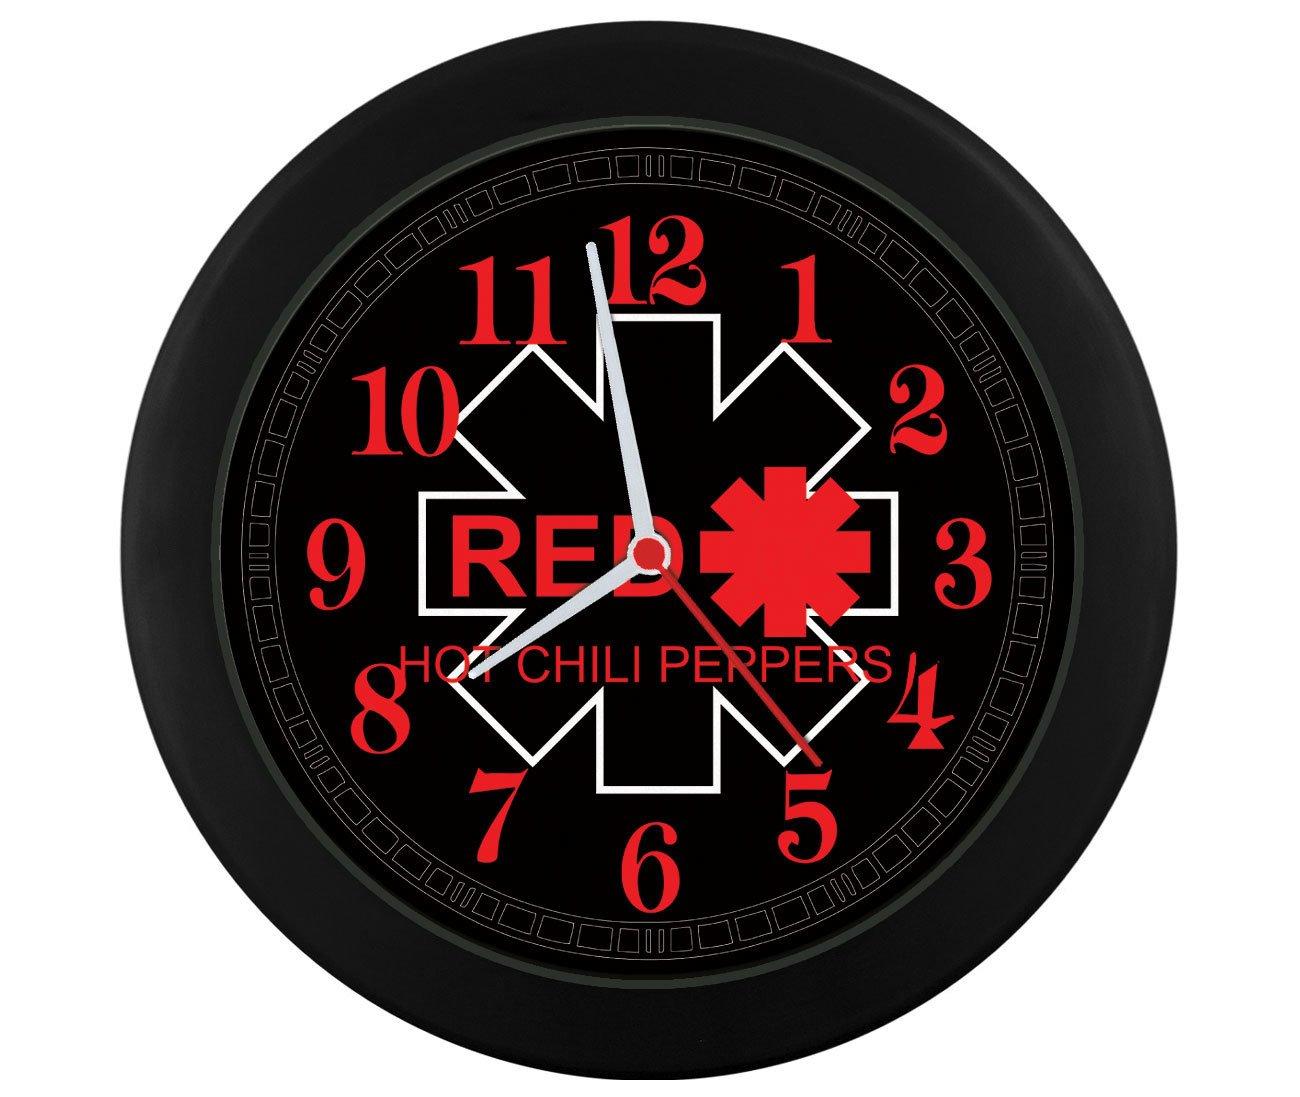 Relógio de parede RHCP